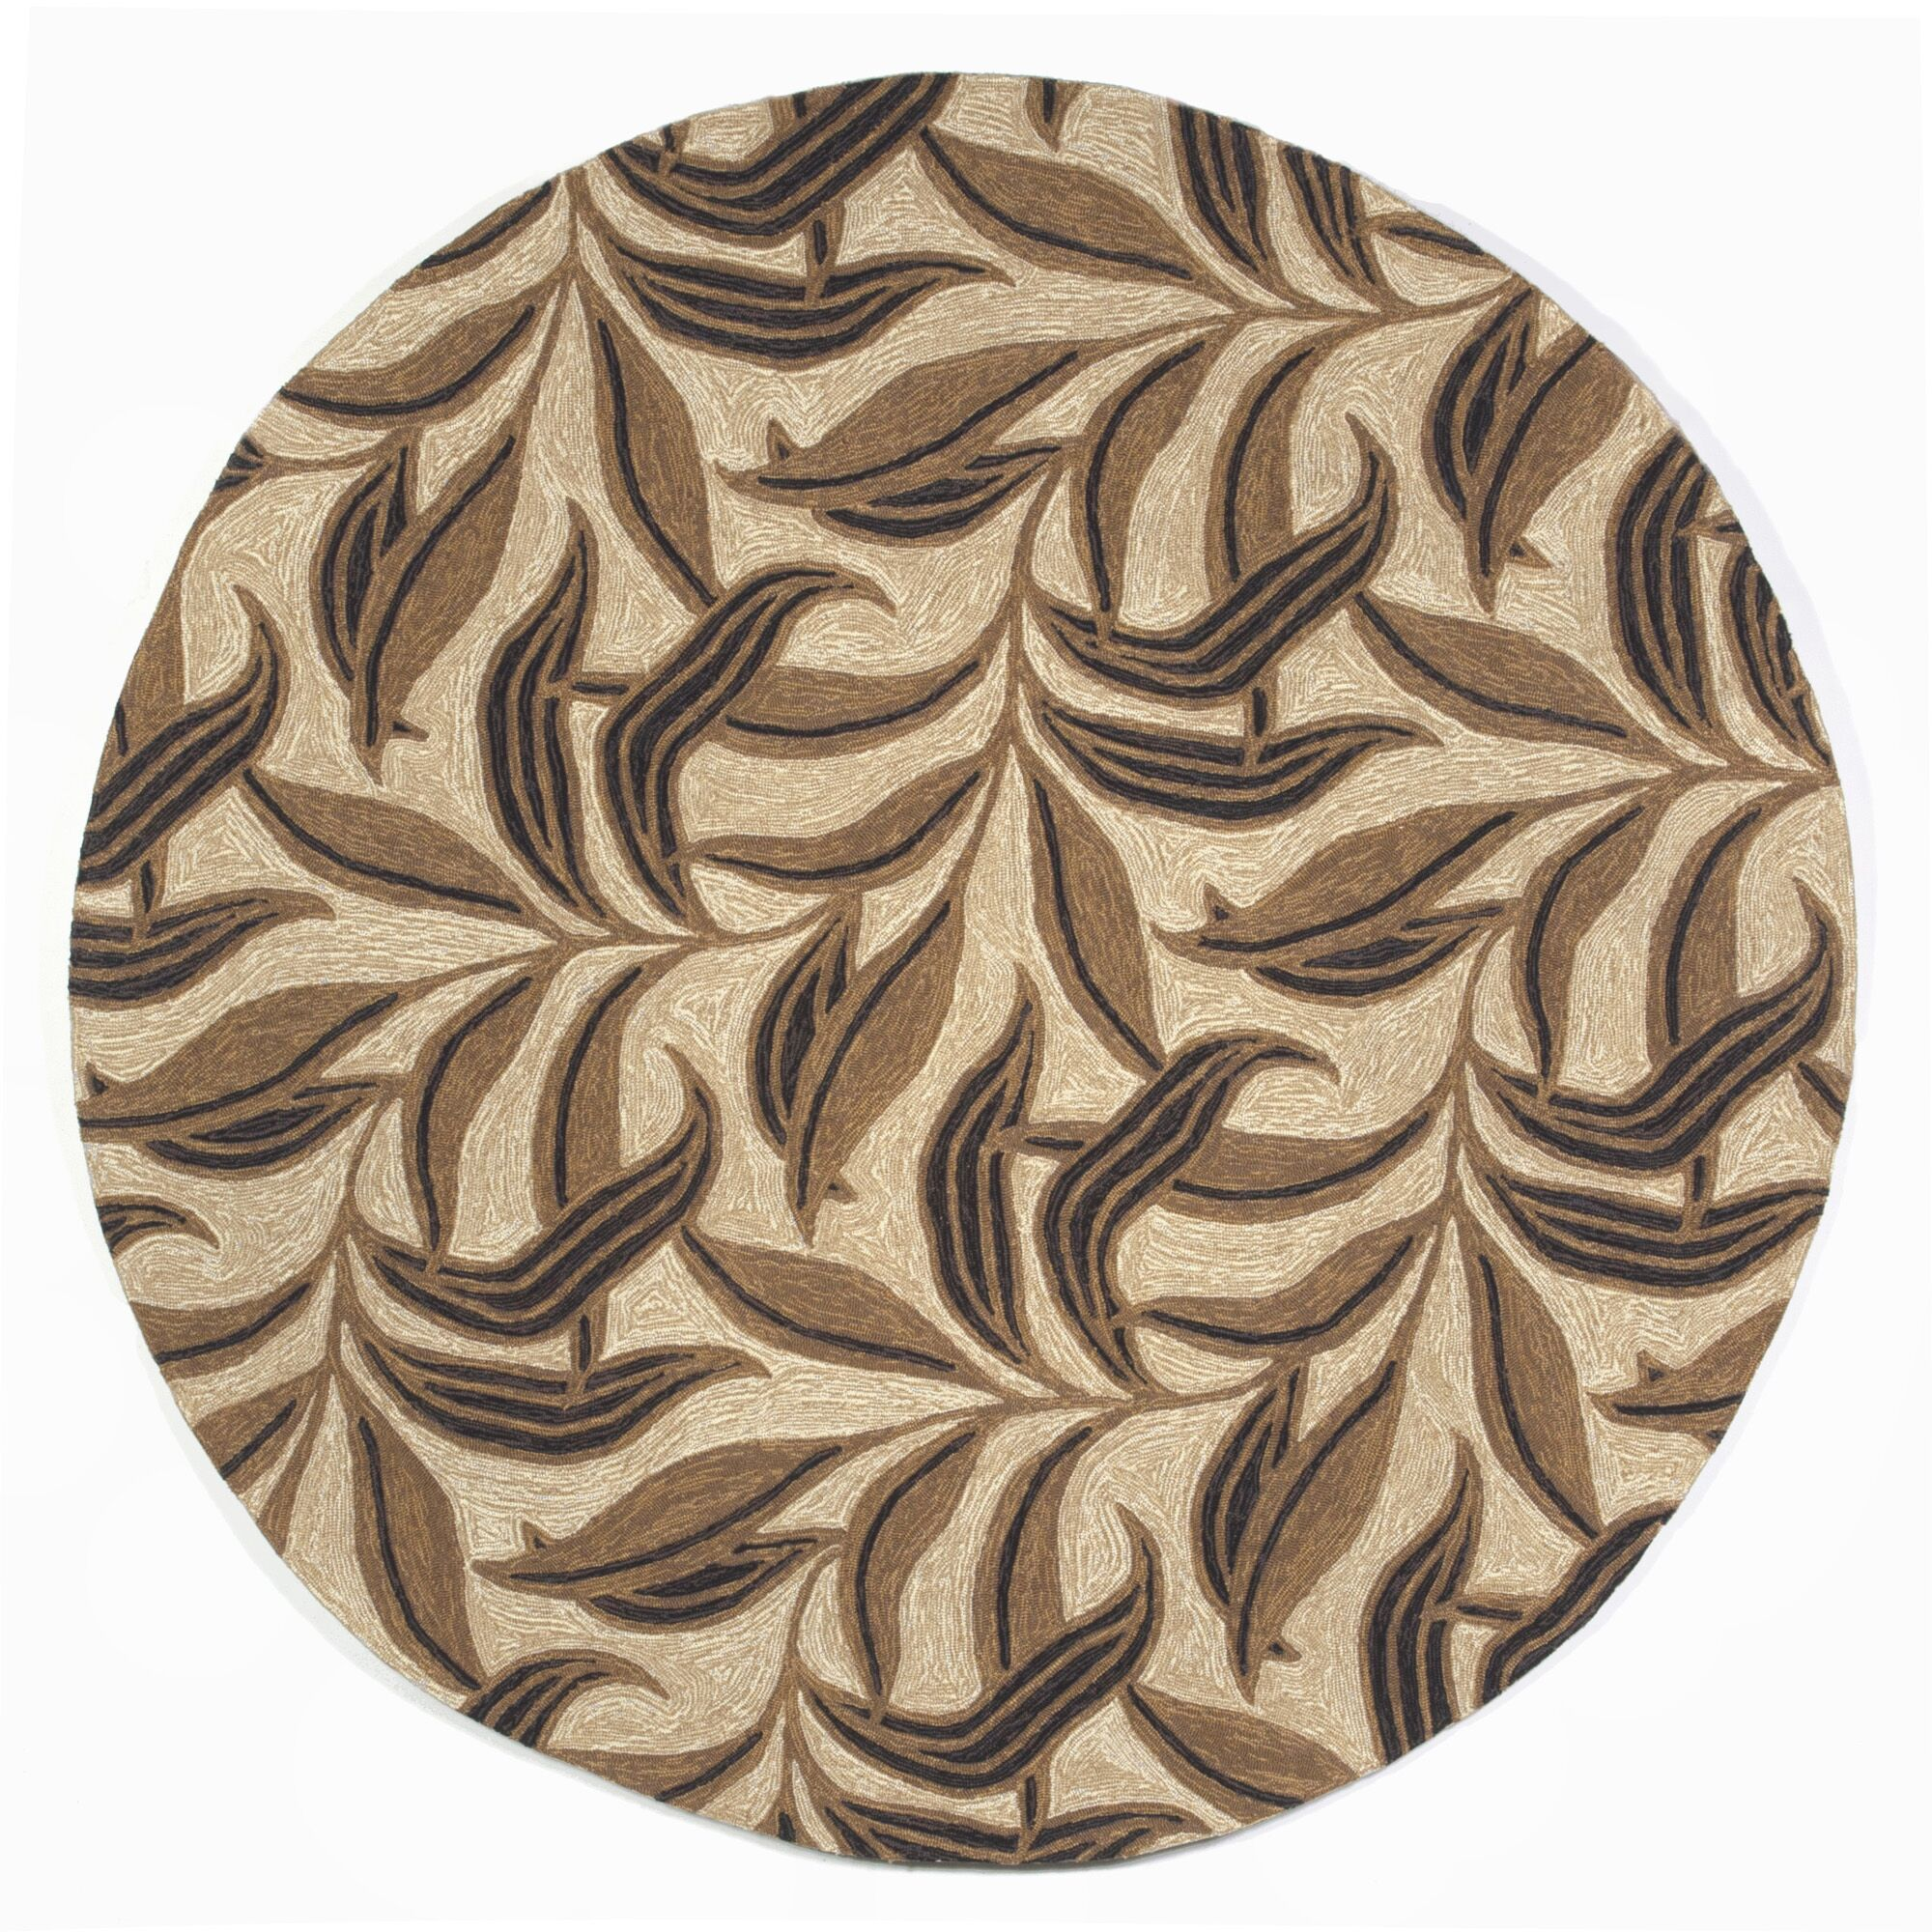 Demirhan Neutral Leaf Outdoor Rug Rug Size: Rectangle 5' x 7'6